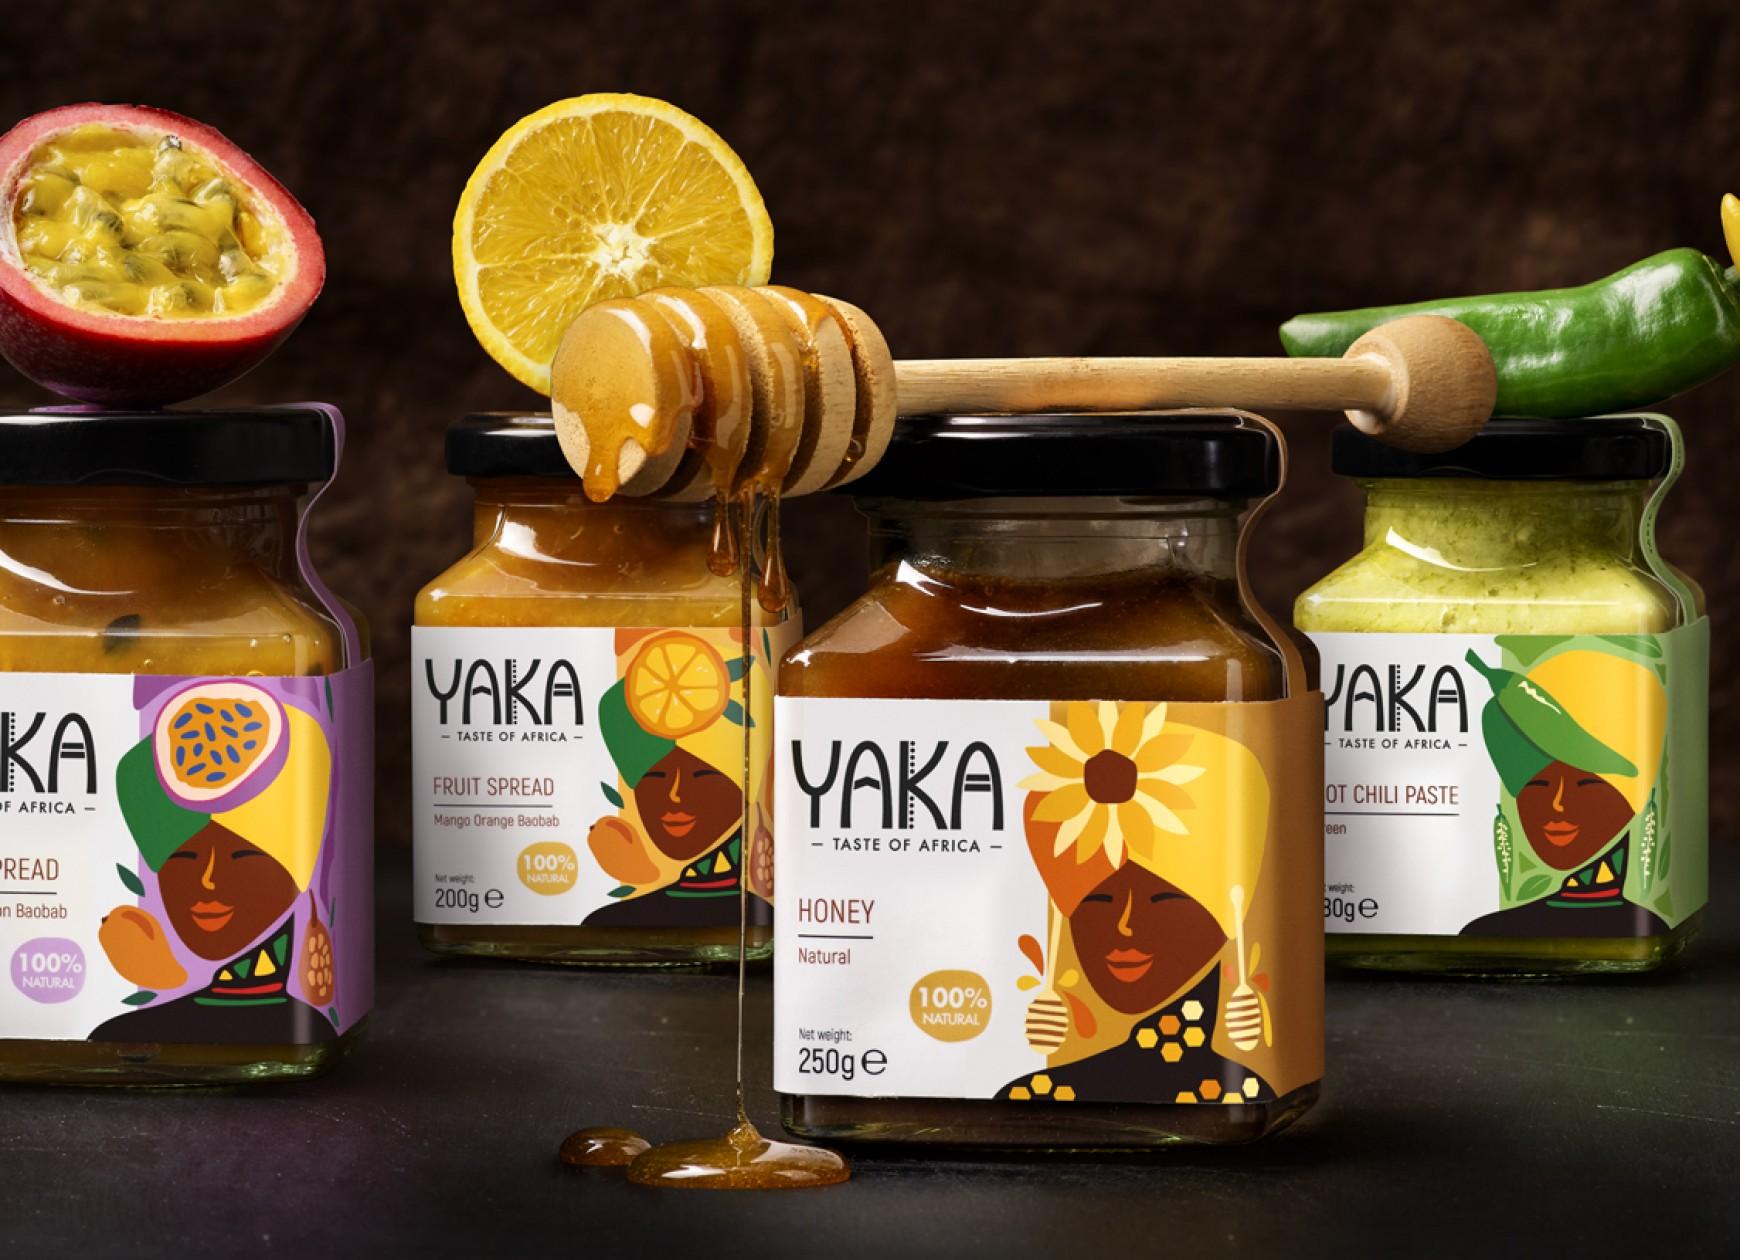 Quatre Mains package design - Yaka, jams, chili paste, quatre mains